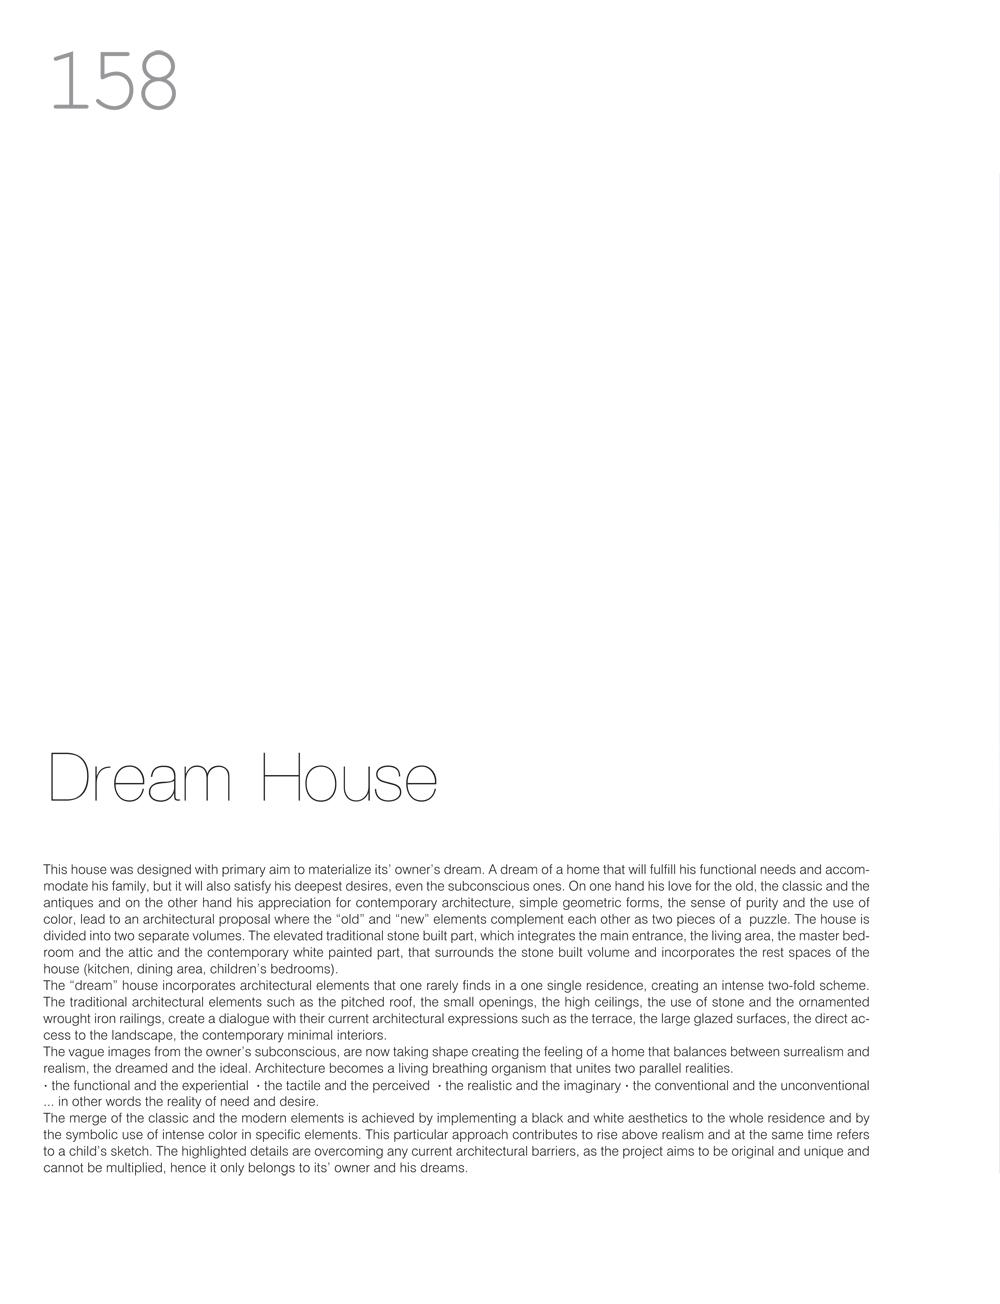 149_161_BoH_Dream_house-10.jpg